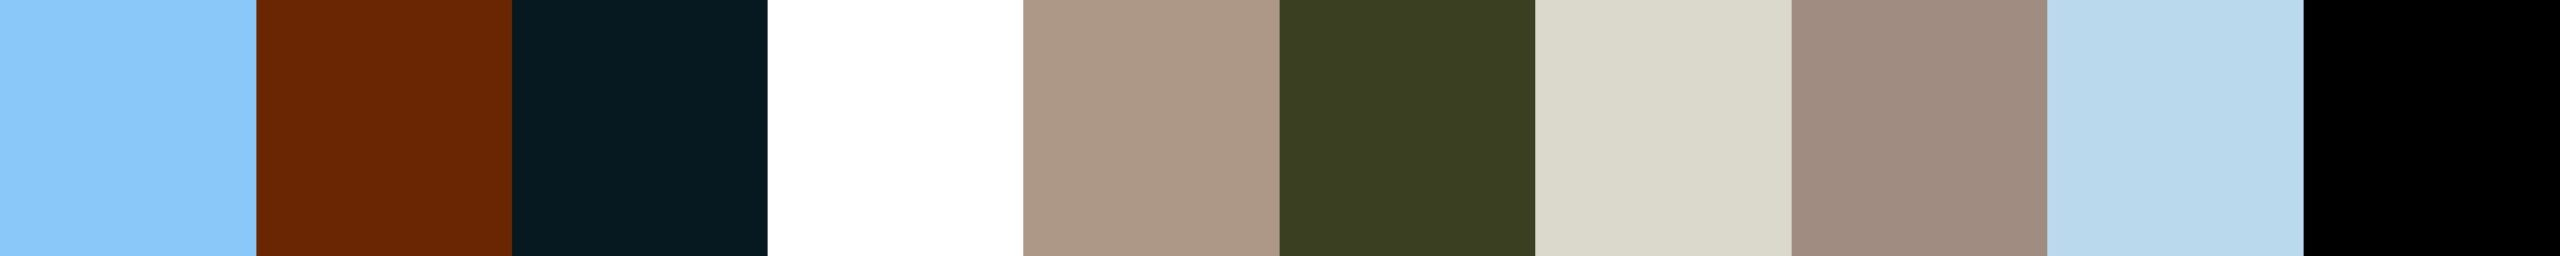 119 Stylia Color Palette